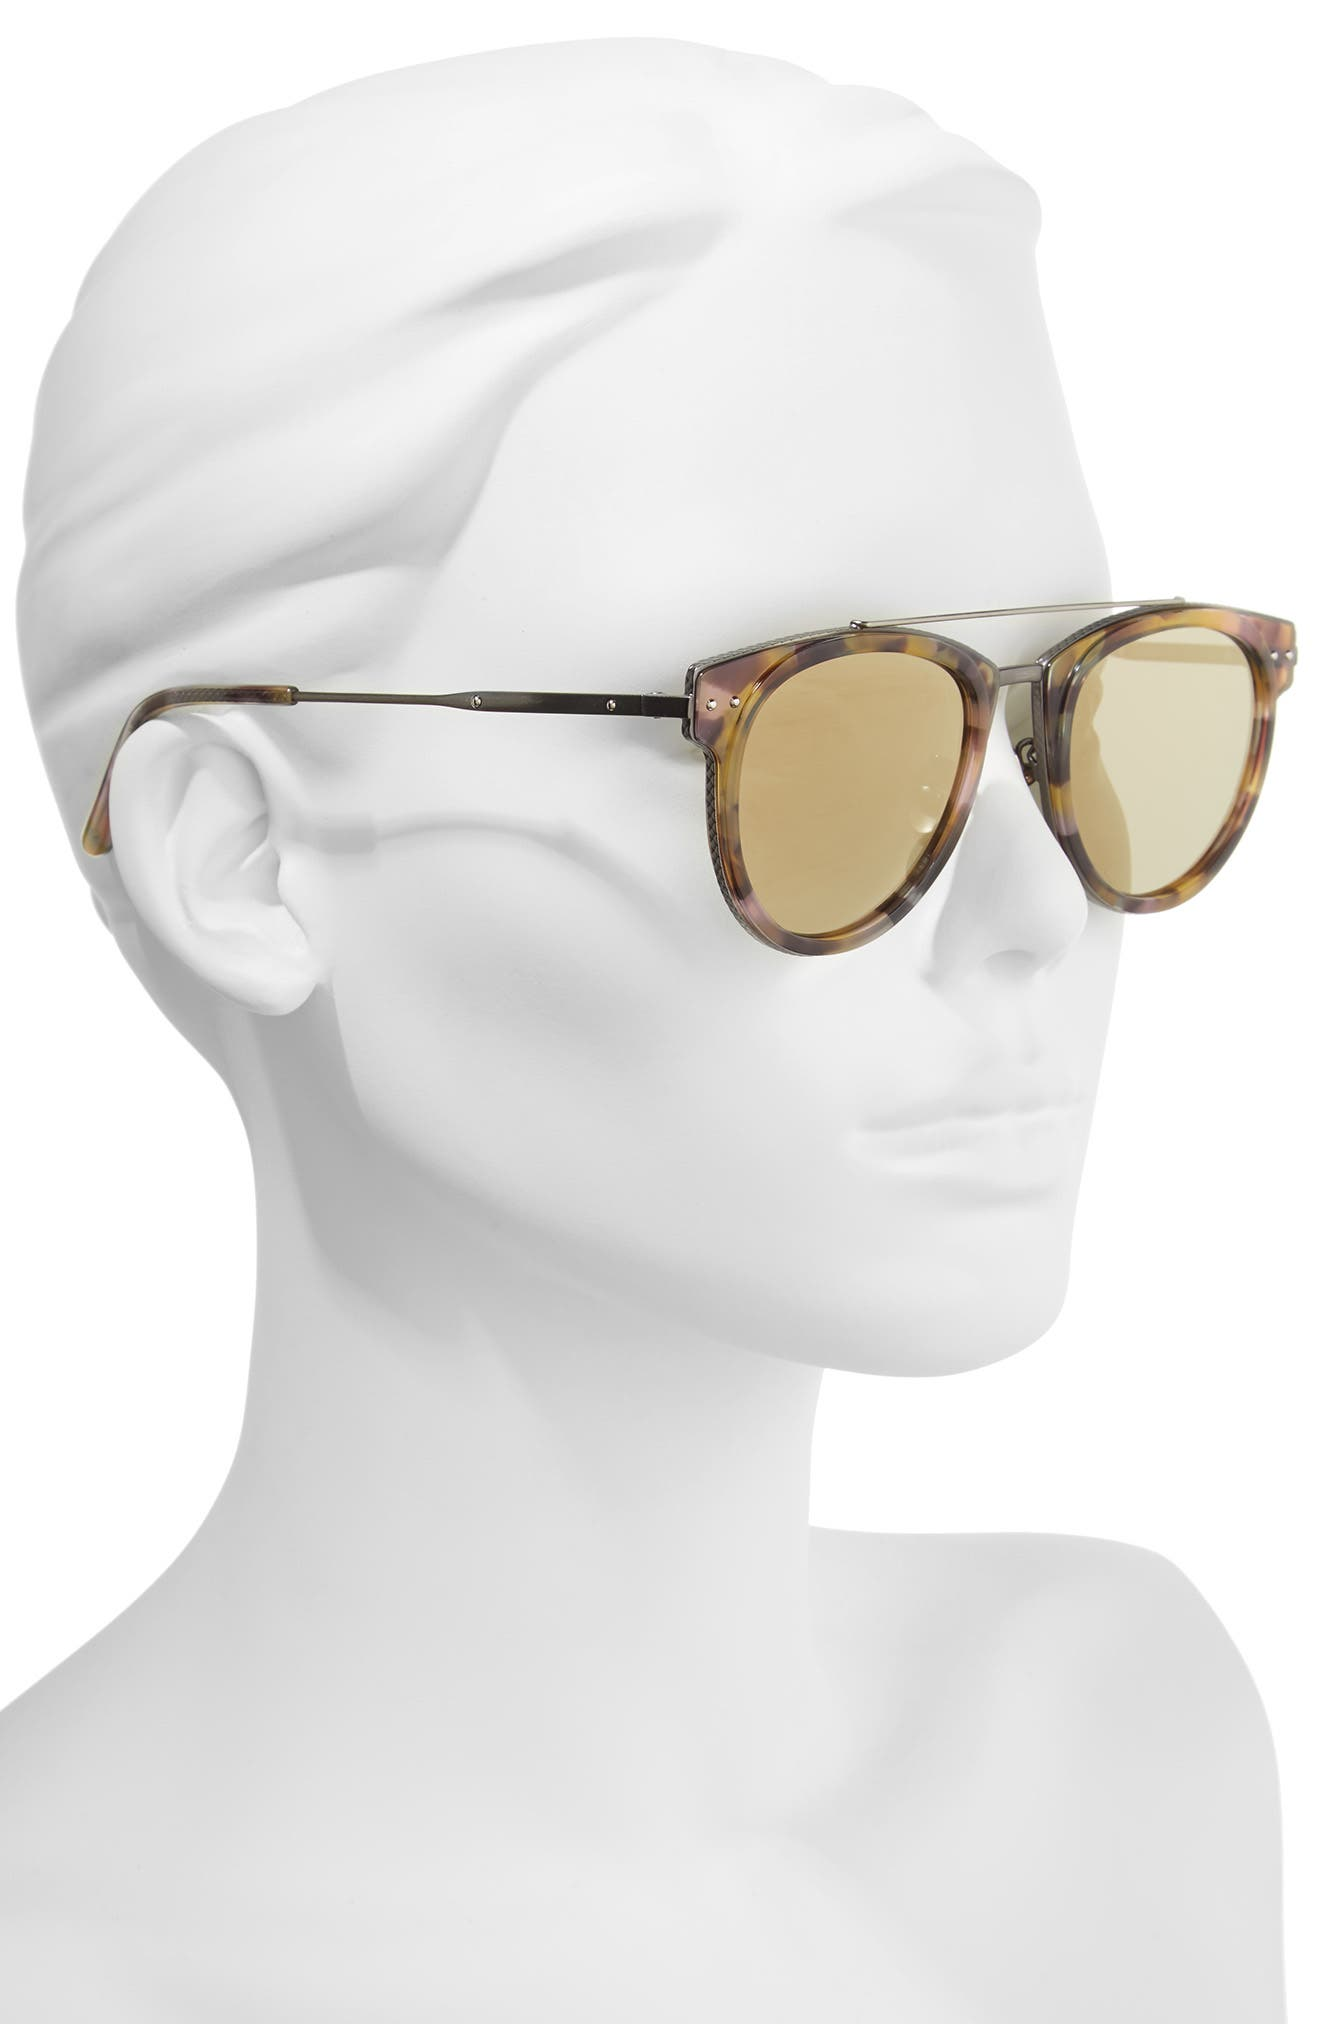 50mm Sunglasses,                             Alternate thumbnail 2, color,                             AVANA BROWN